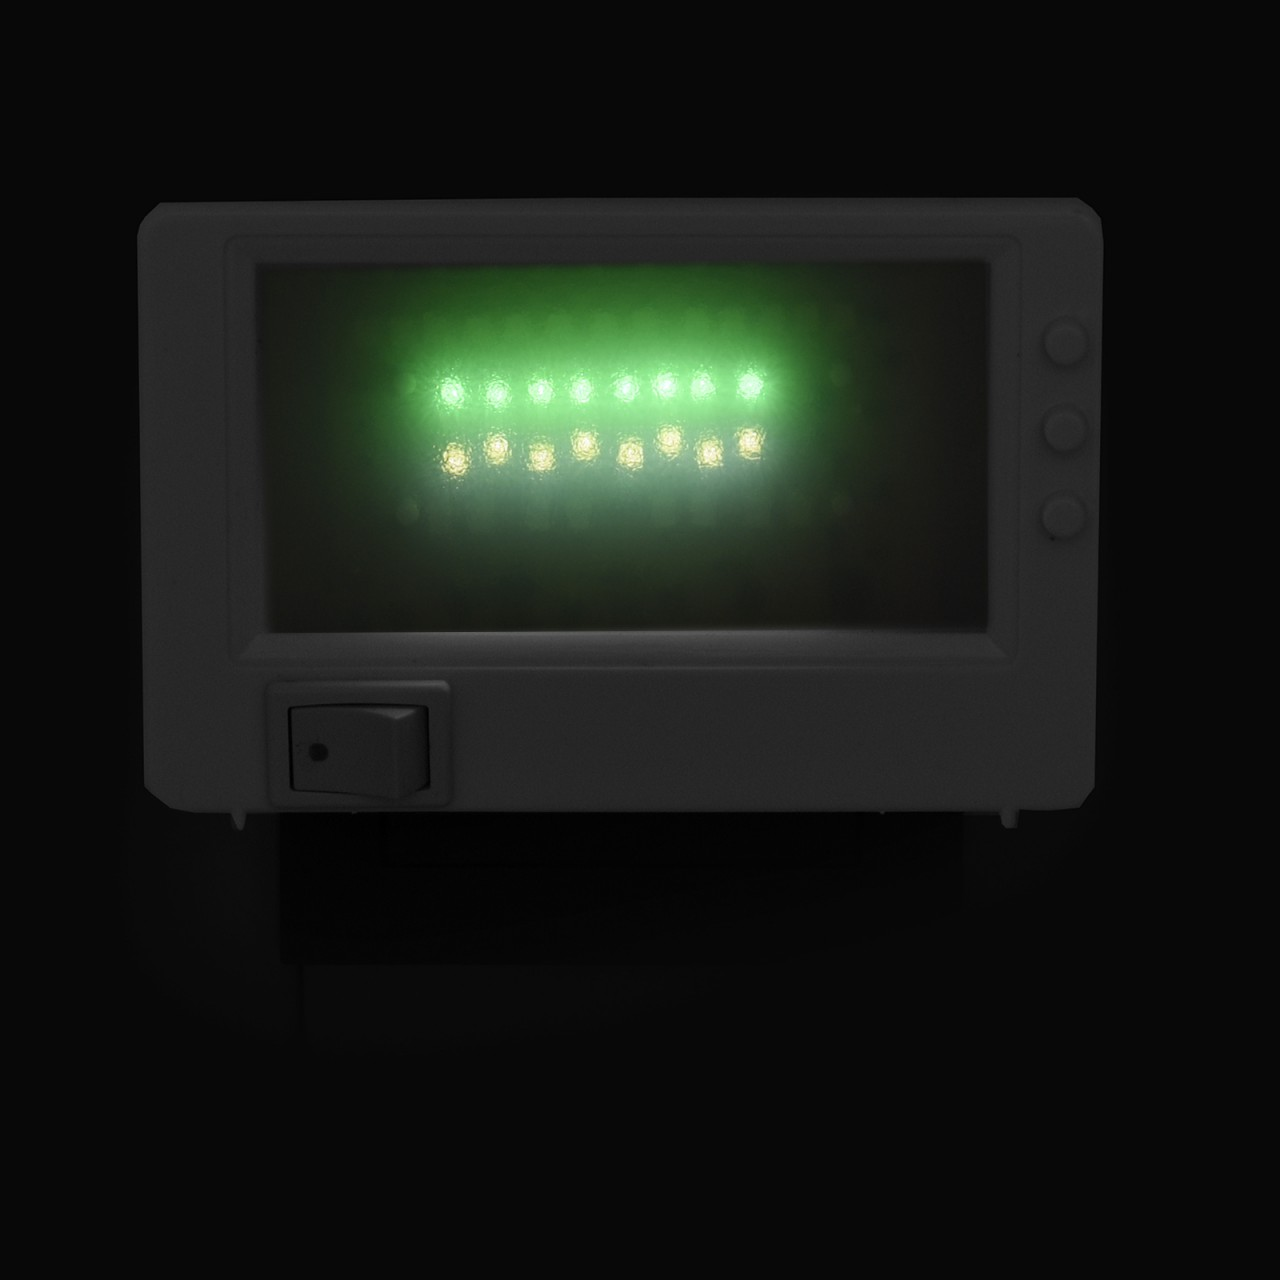 led tv simulator kompakt 37 leds fernseh attrappe dummy einbruchschutz fake tv ebay. Black Bedroom Furniture Sets. Home Design Ideas